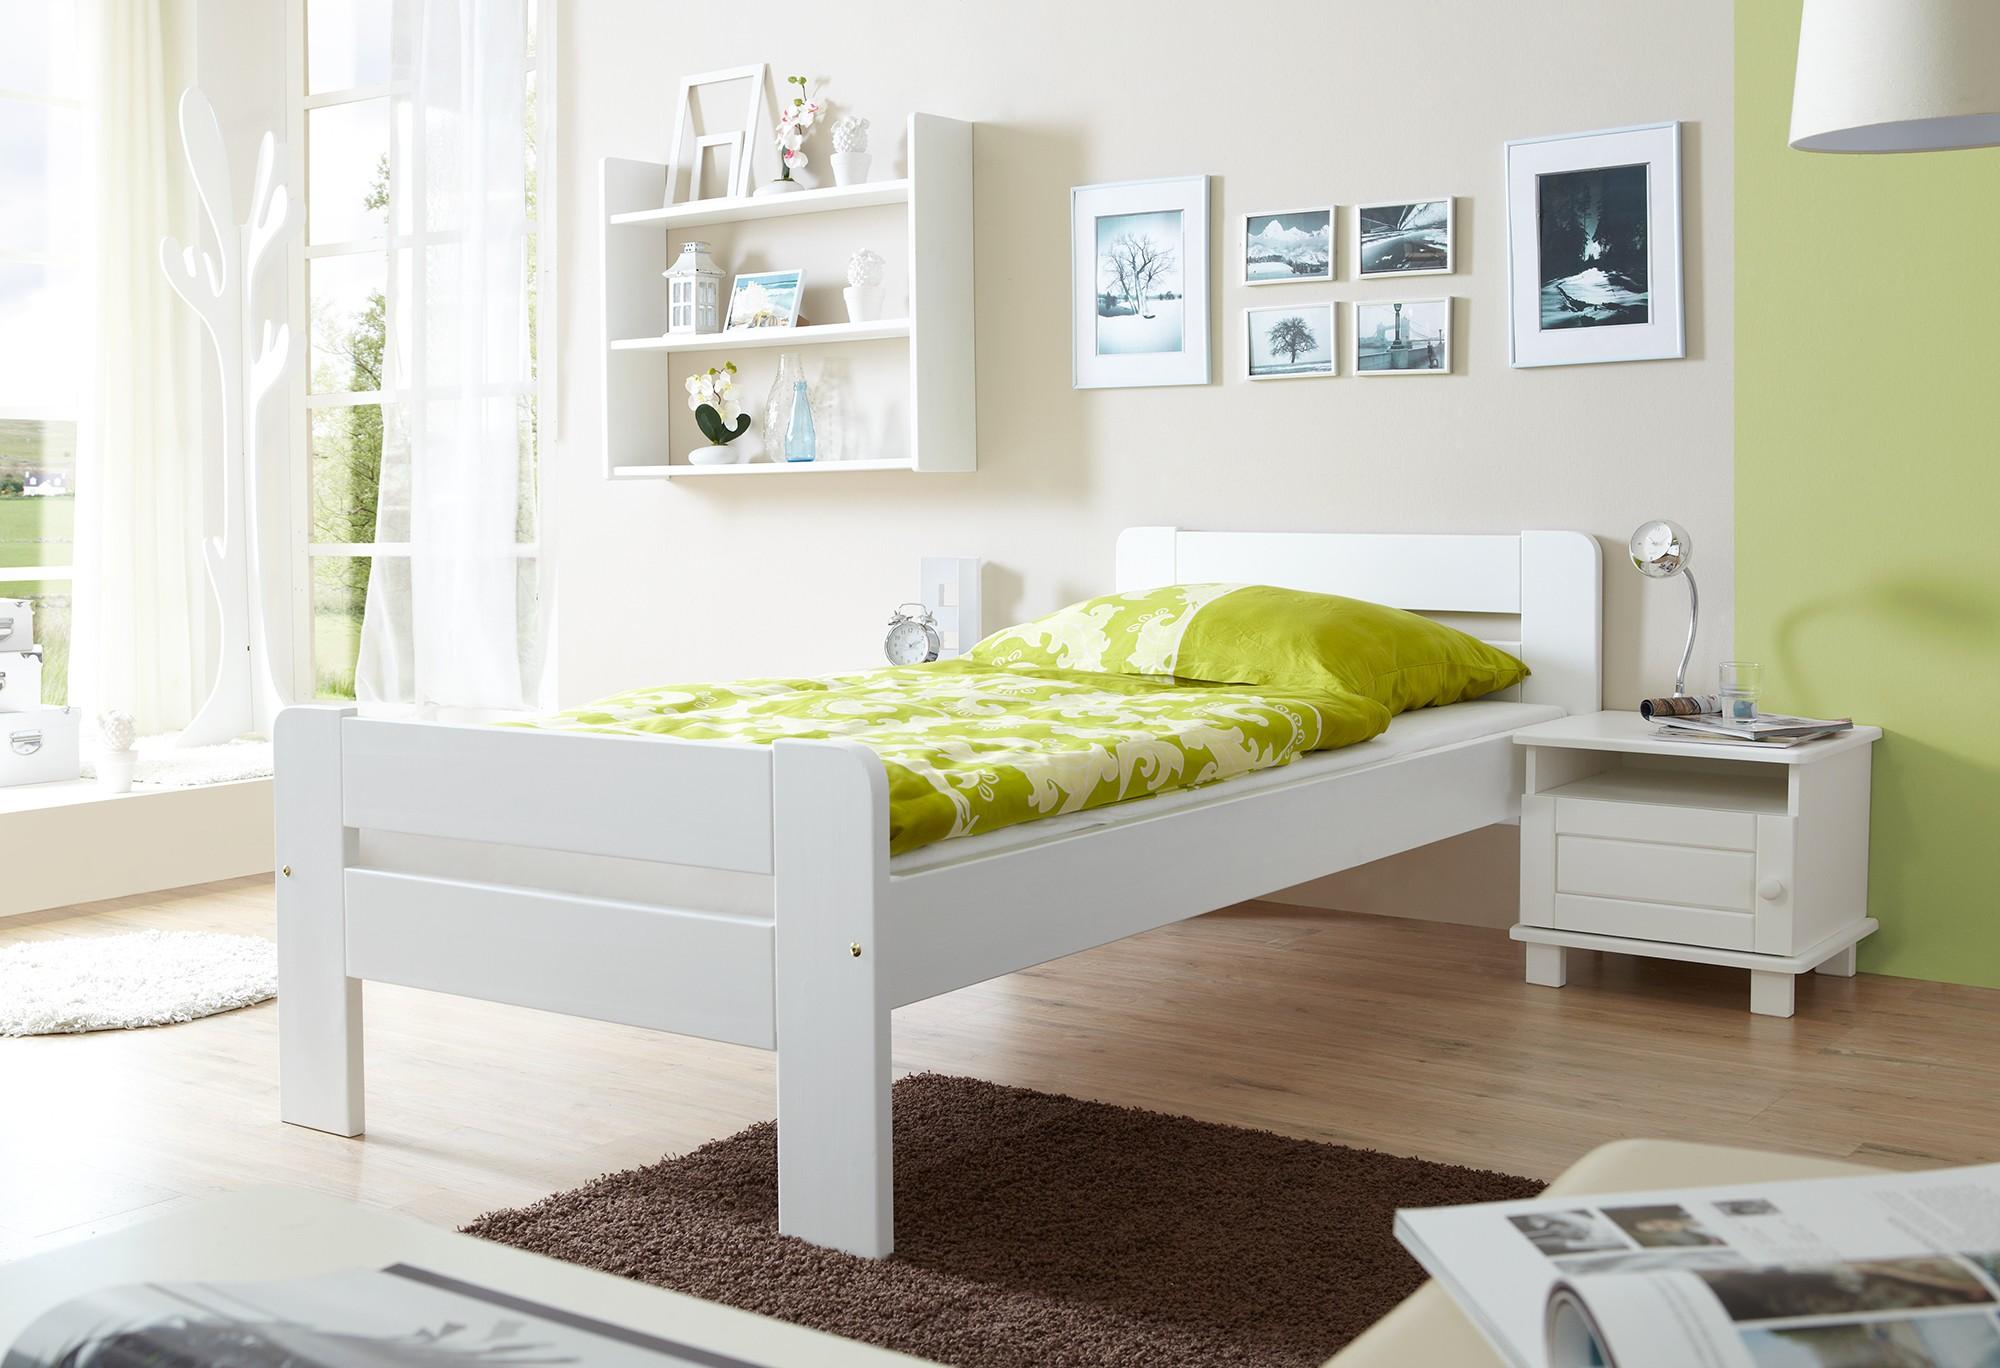 Elegant Einzelbett Weiß Beste Wahl 90x200 Mod.857644 Kiefer Weiss